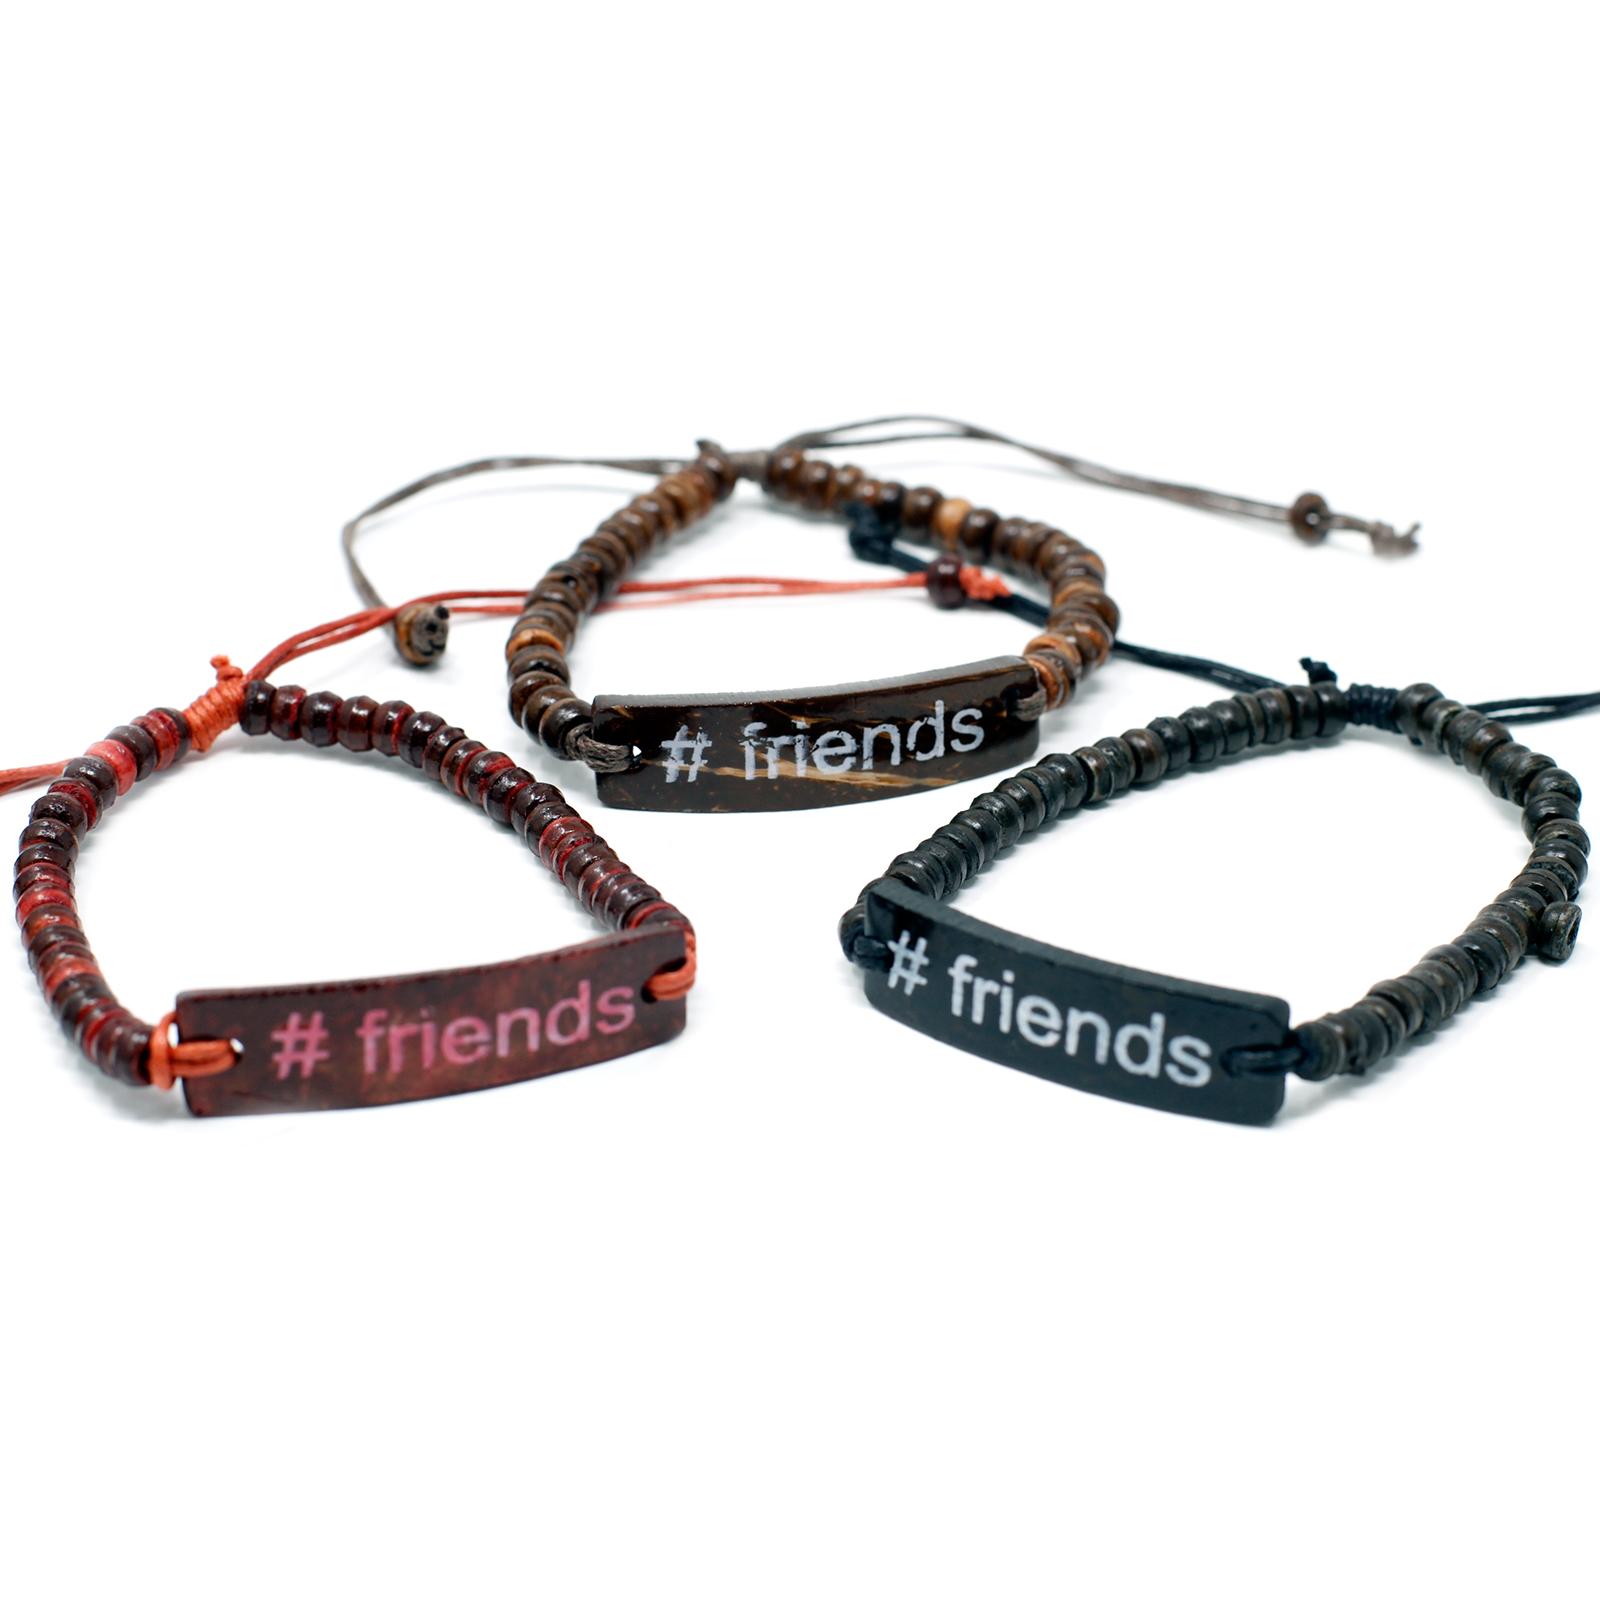 Coco Slogan Bracelets  Friends